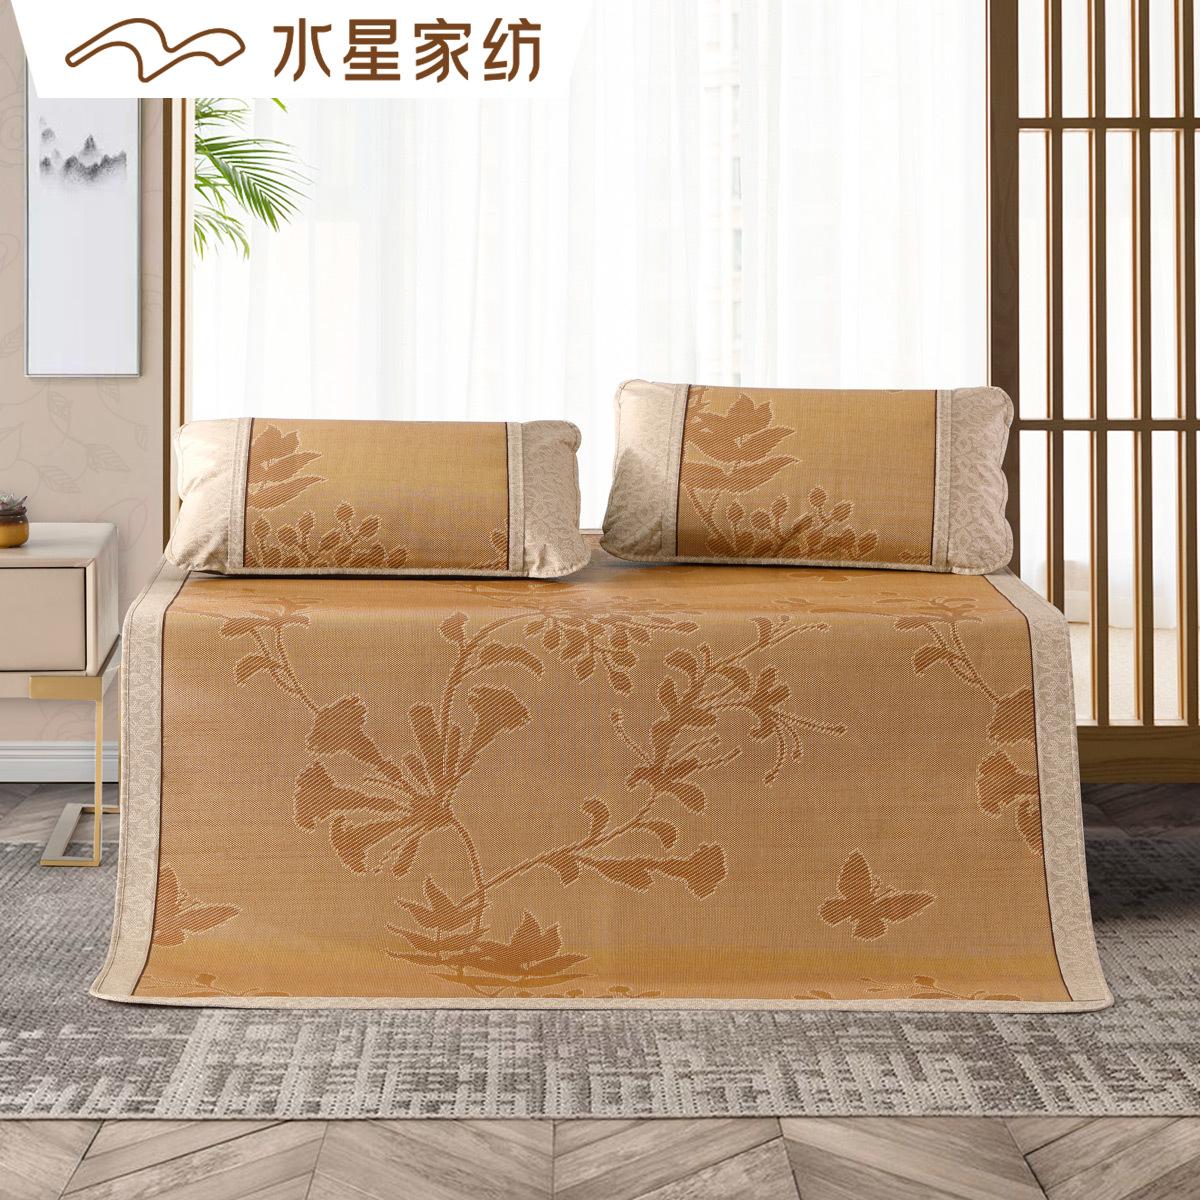 Декоративные одеяла и подушки / Прикроватные коврики Артикул 615184816432